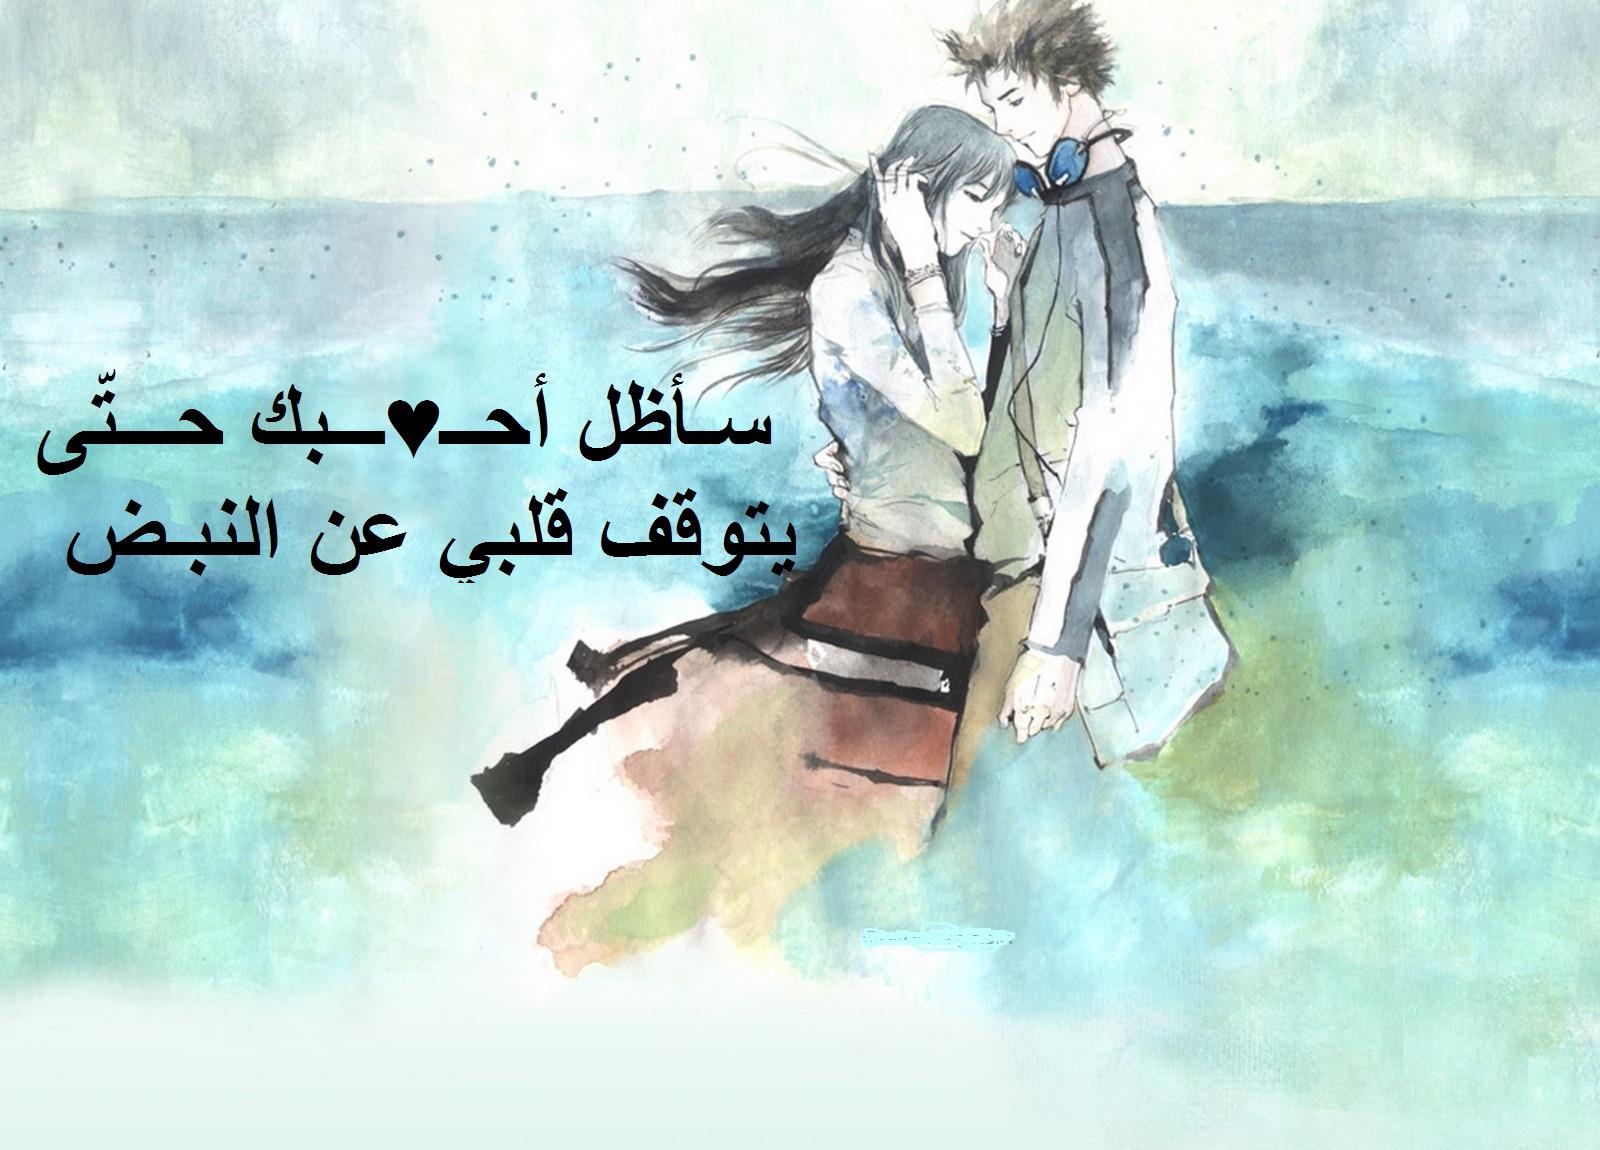 كلام حب رومانسي قصير مزخرف.